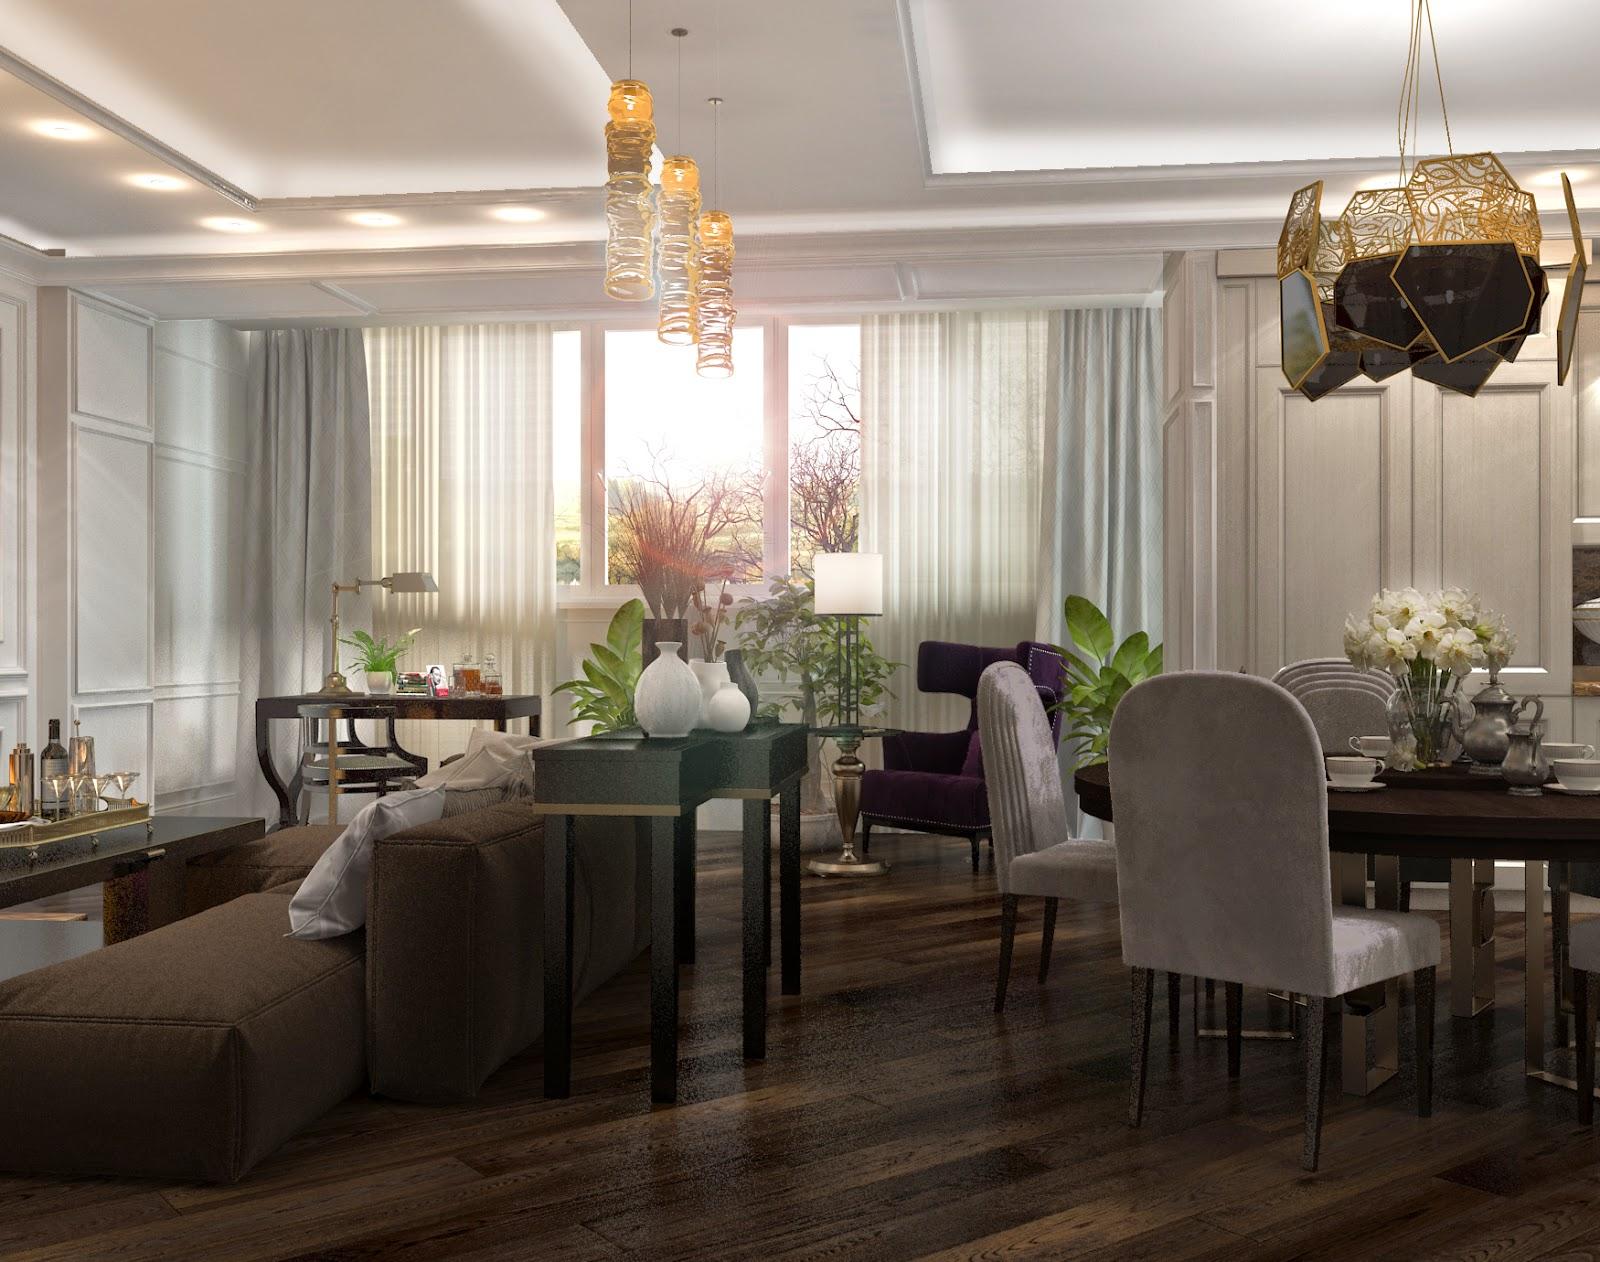 Darya girina interior design march 2015 - Darya Girina Interior Design March 2015 5